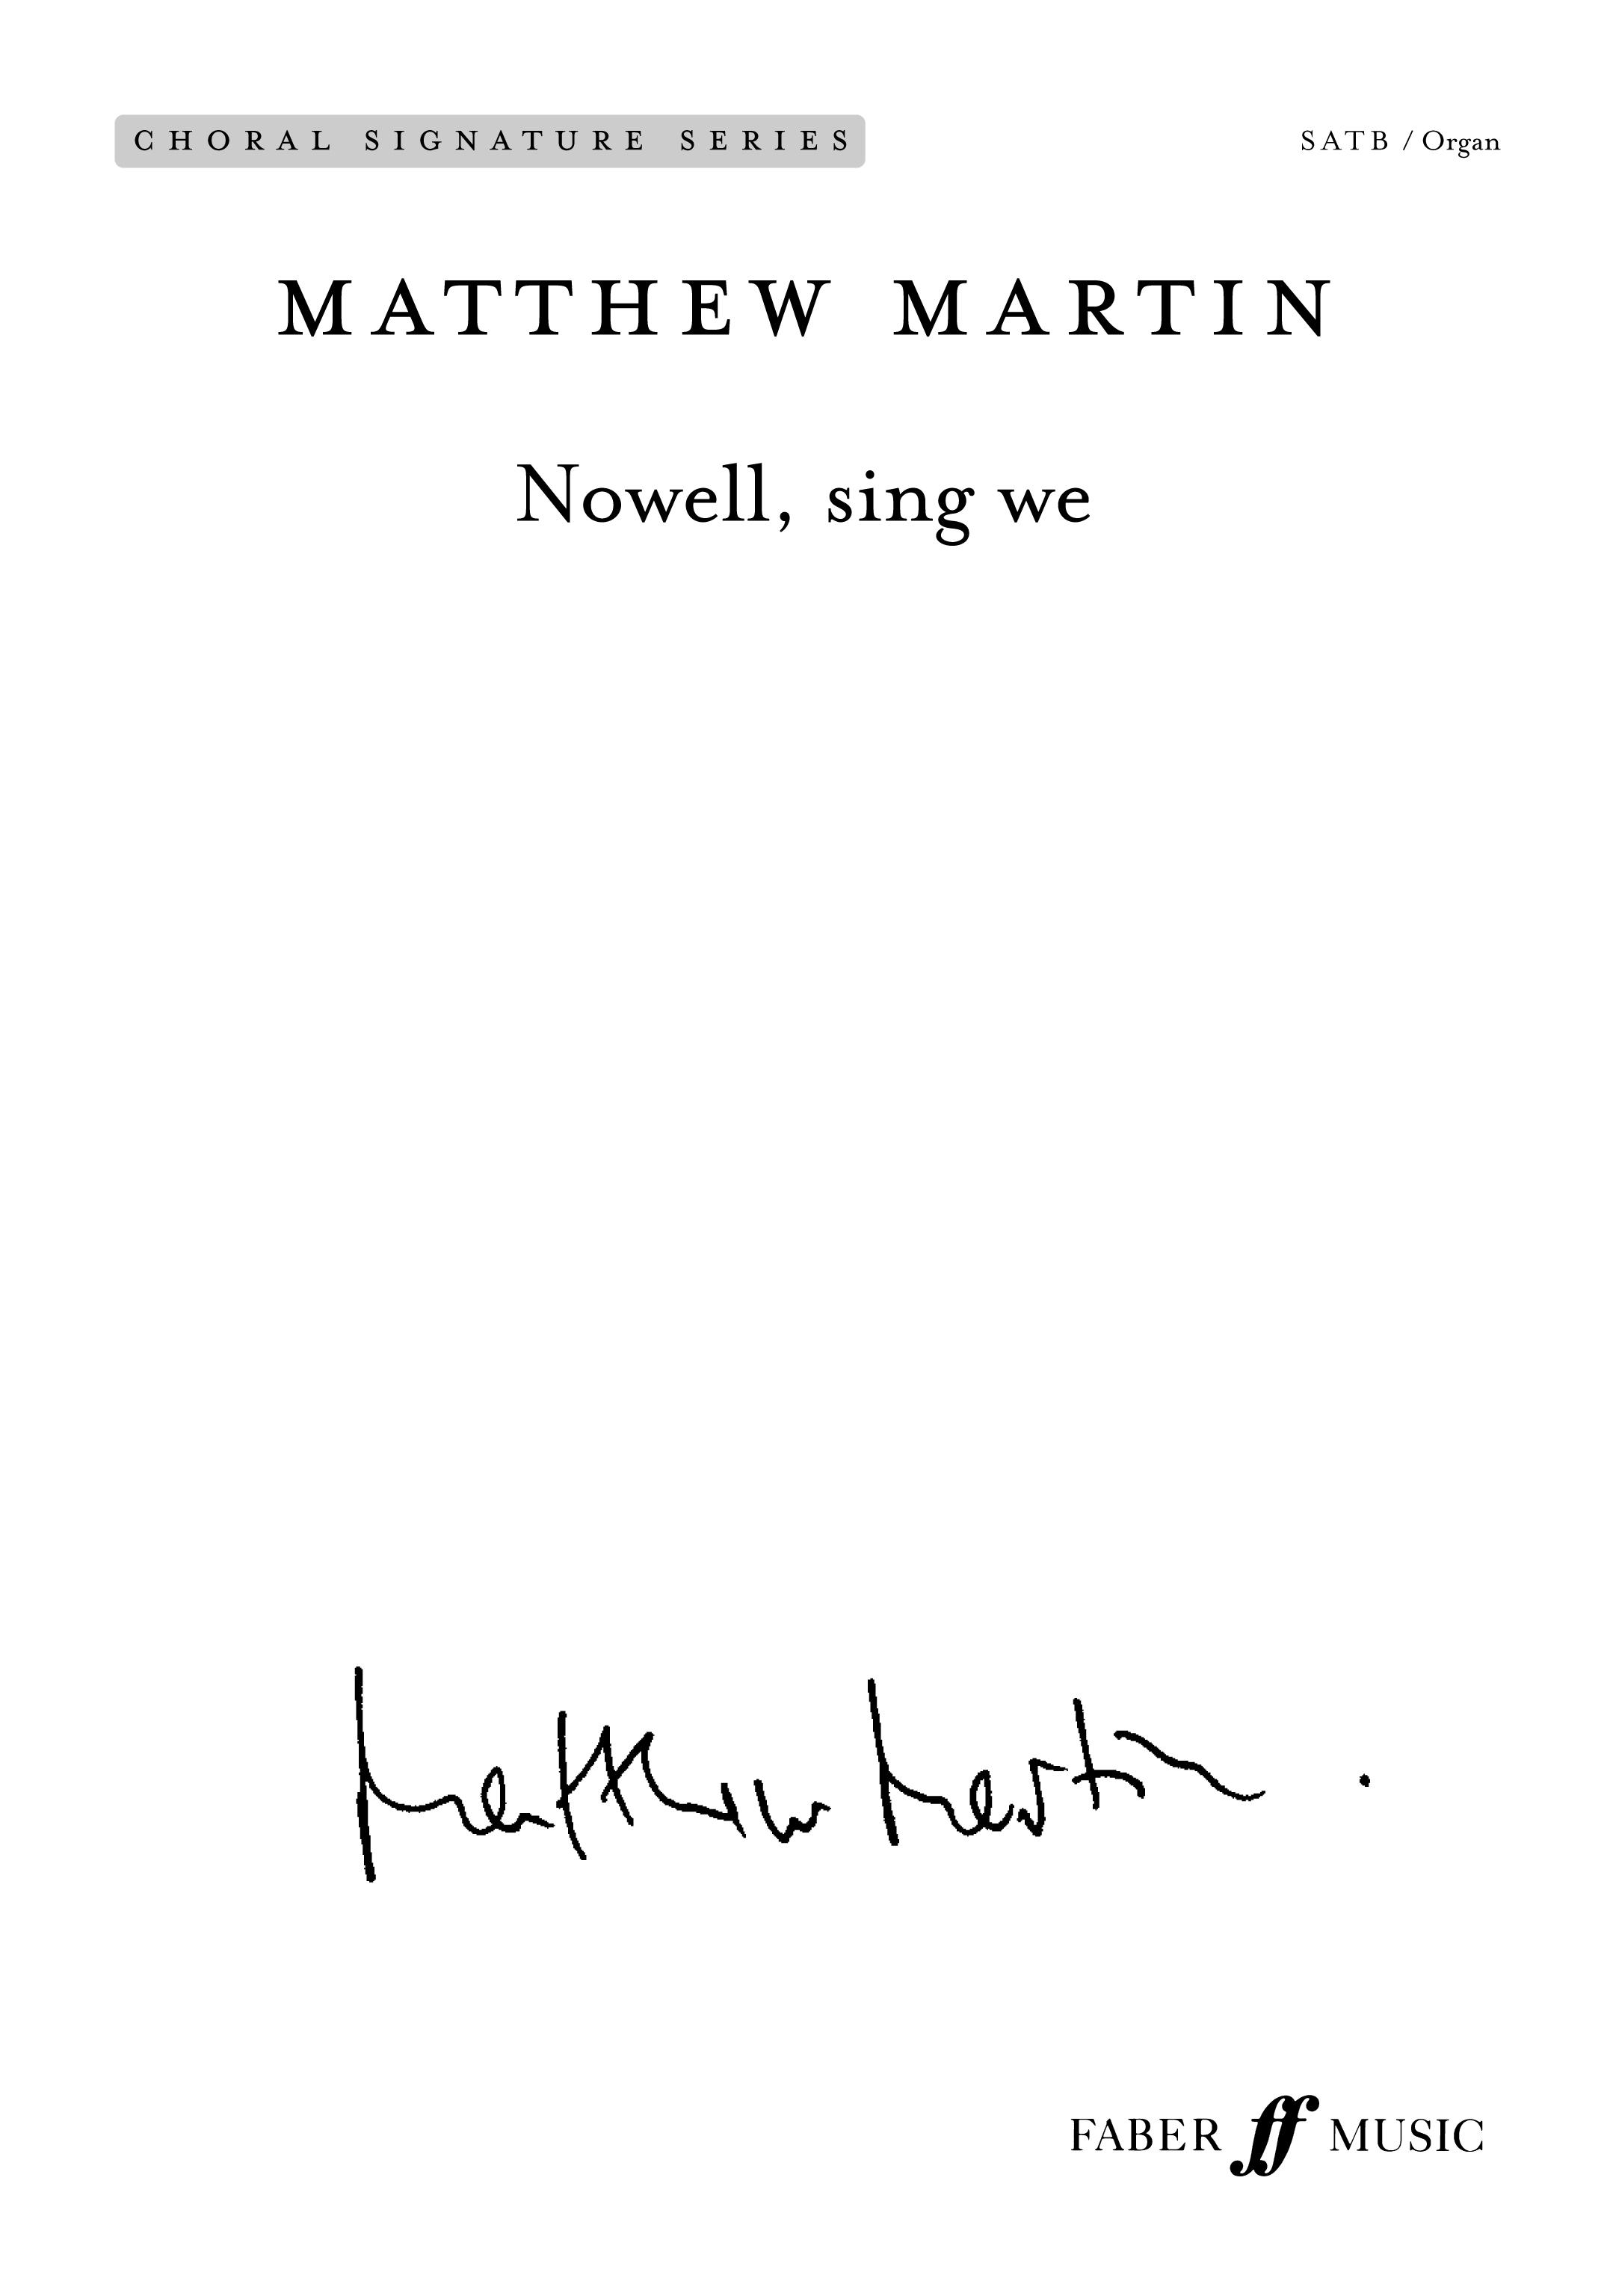 Matthew Martin: Nowell  sing we: SATB: Vocal Score